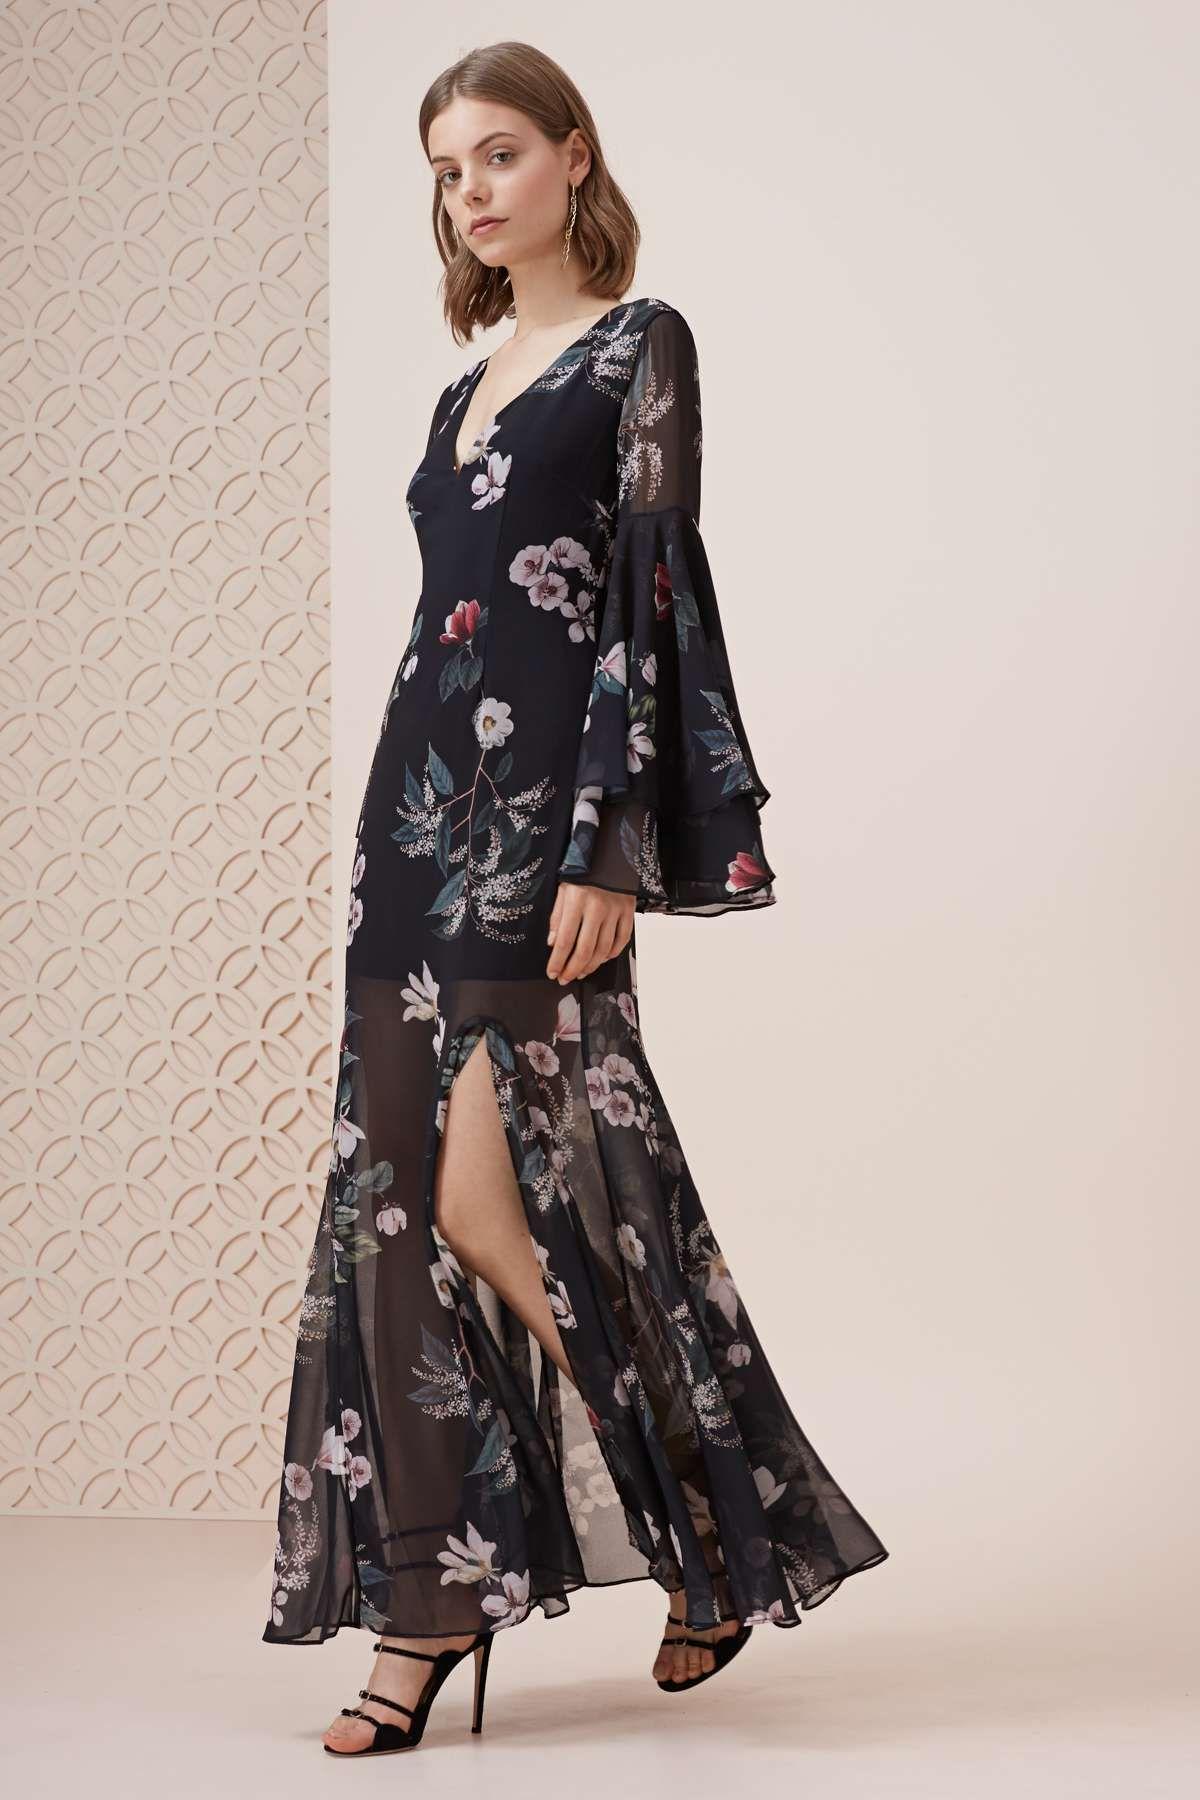 Cosmic girl maxi dress dark garden floral collections pinterest